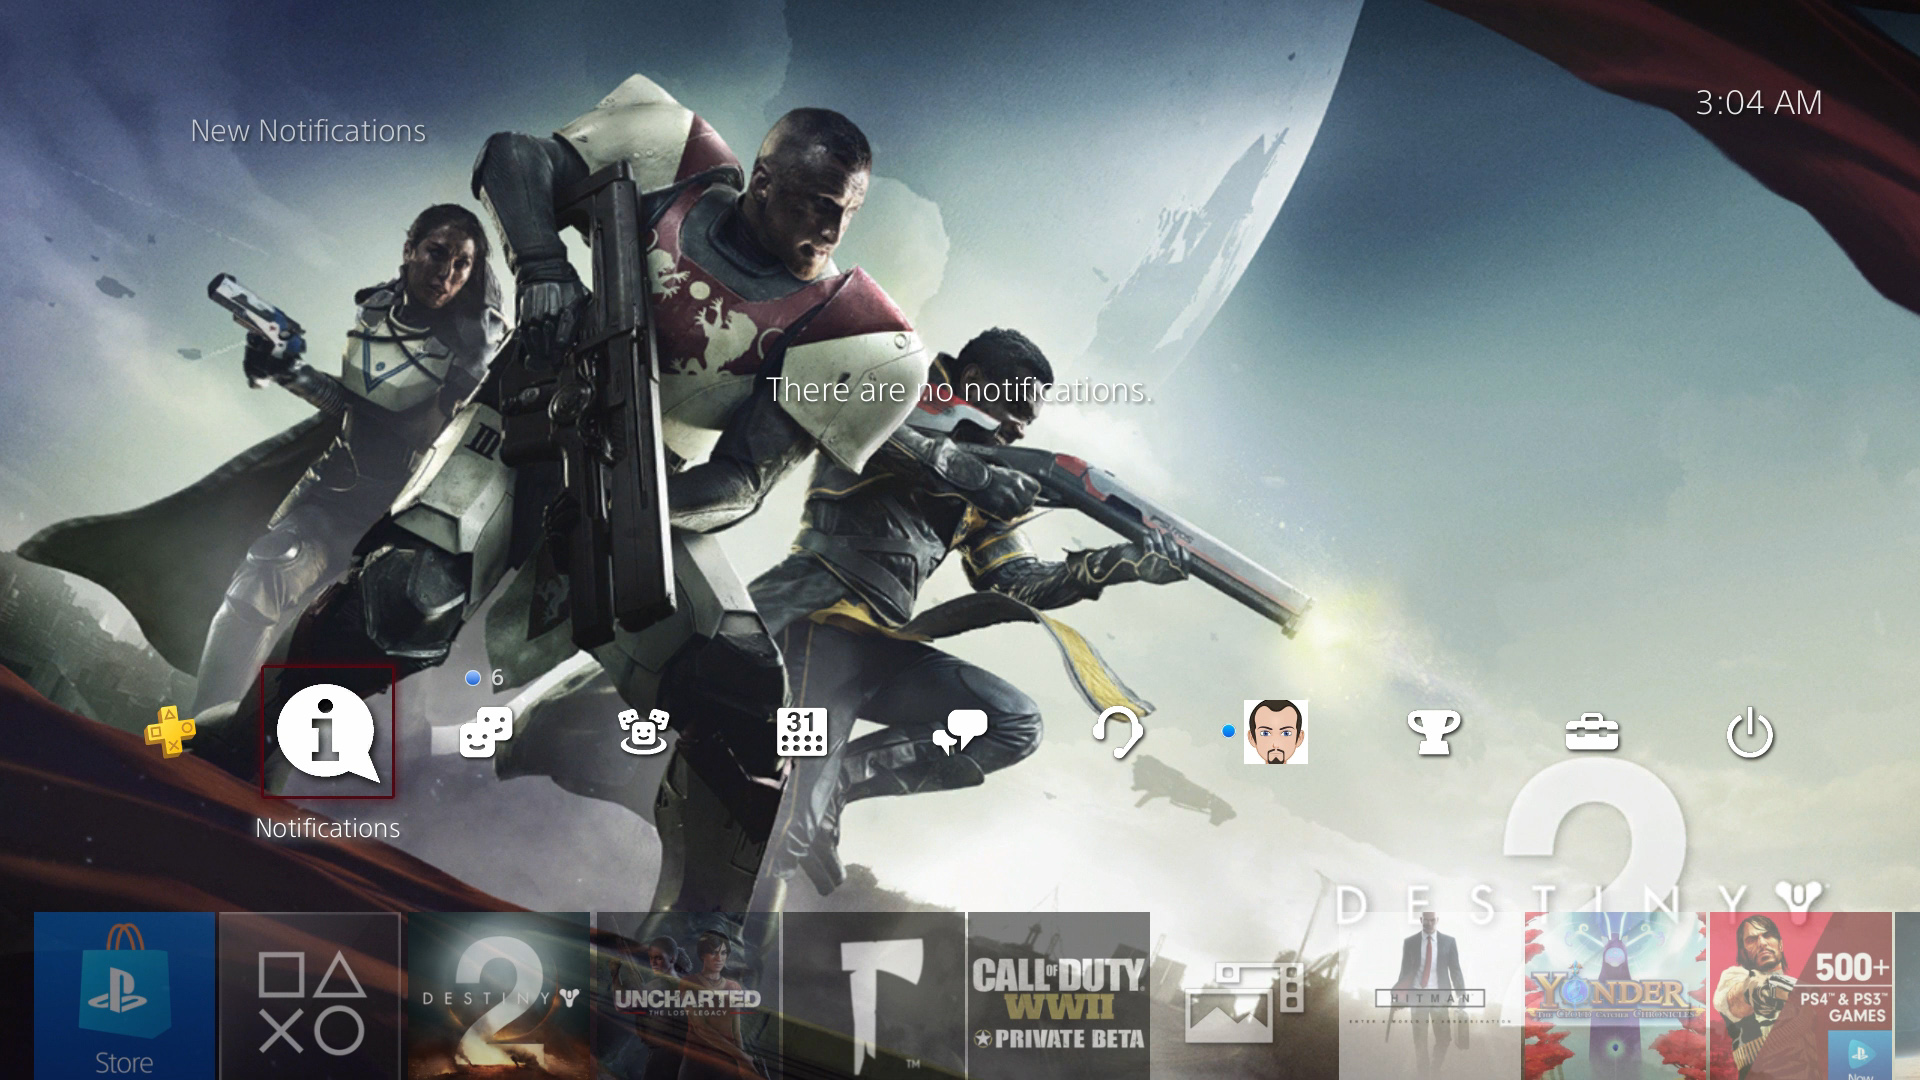 Destiny 2 Dynamic Theme | AllGamers